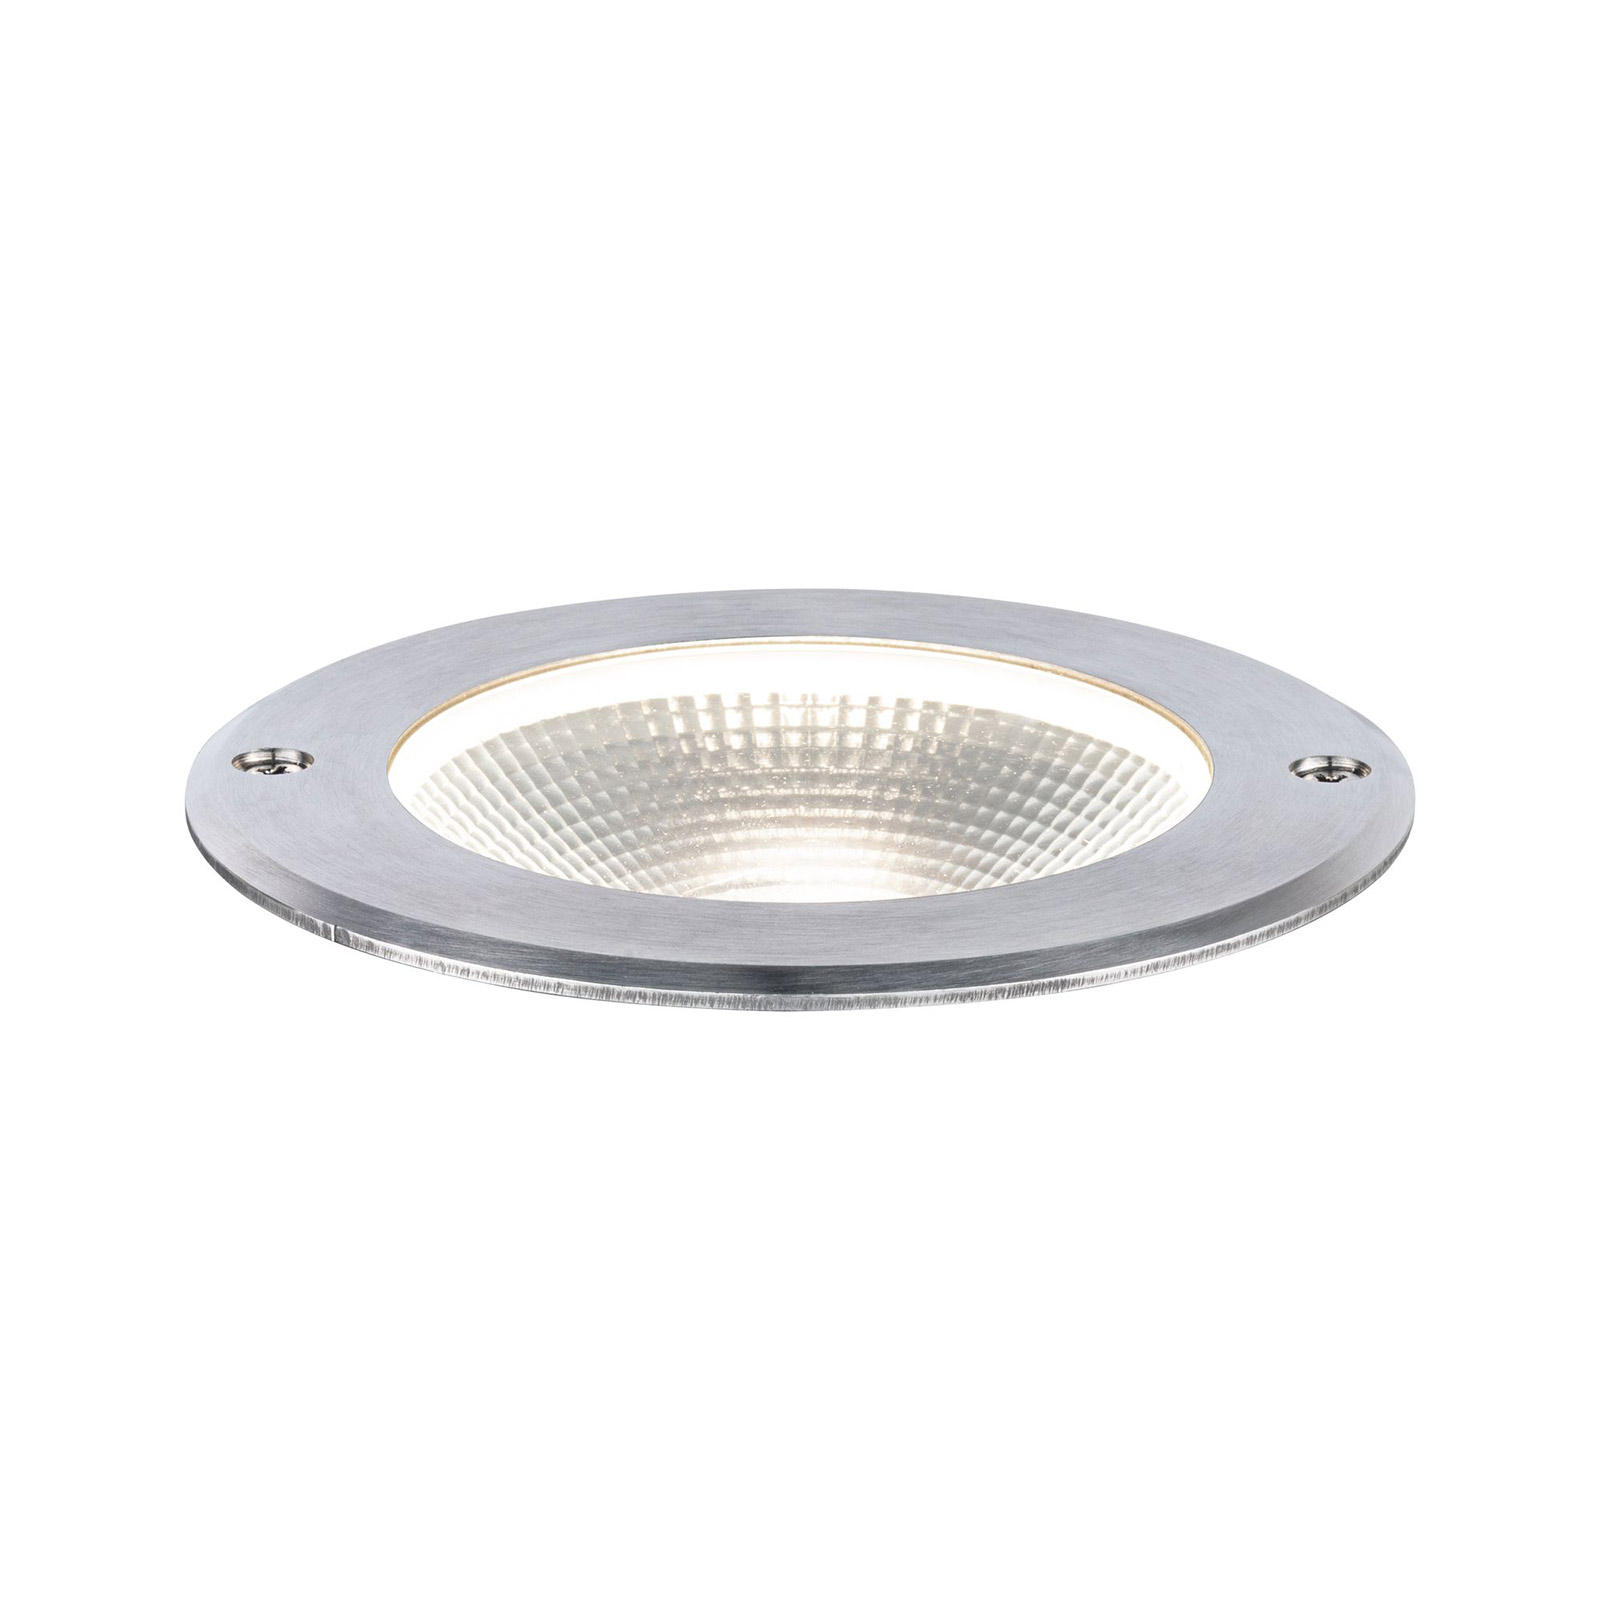 Paulmann Floor LED-Bodeneinbauleuchte IP67